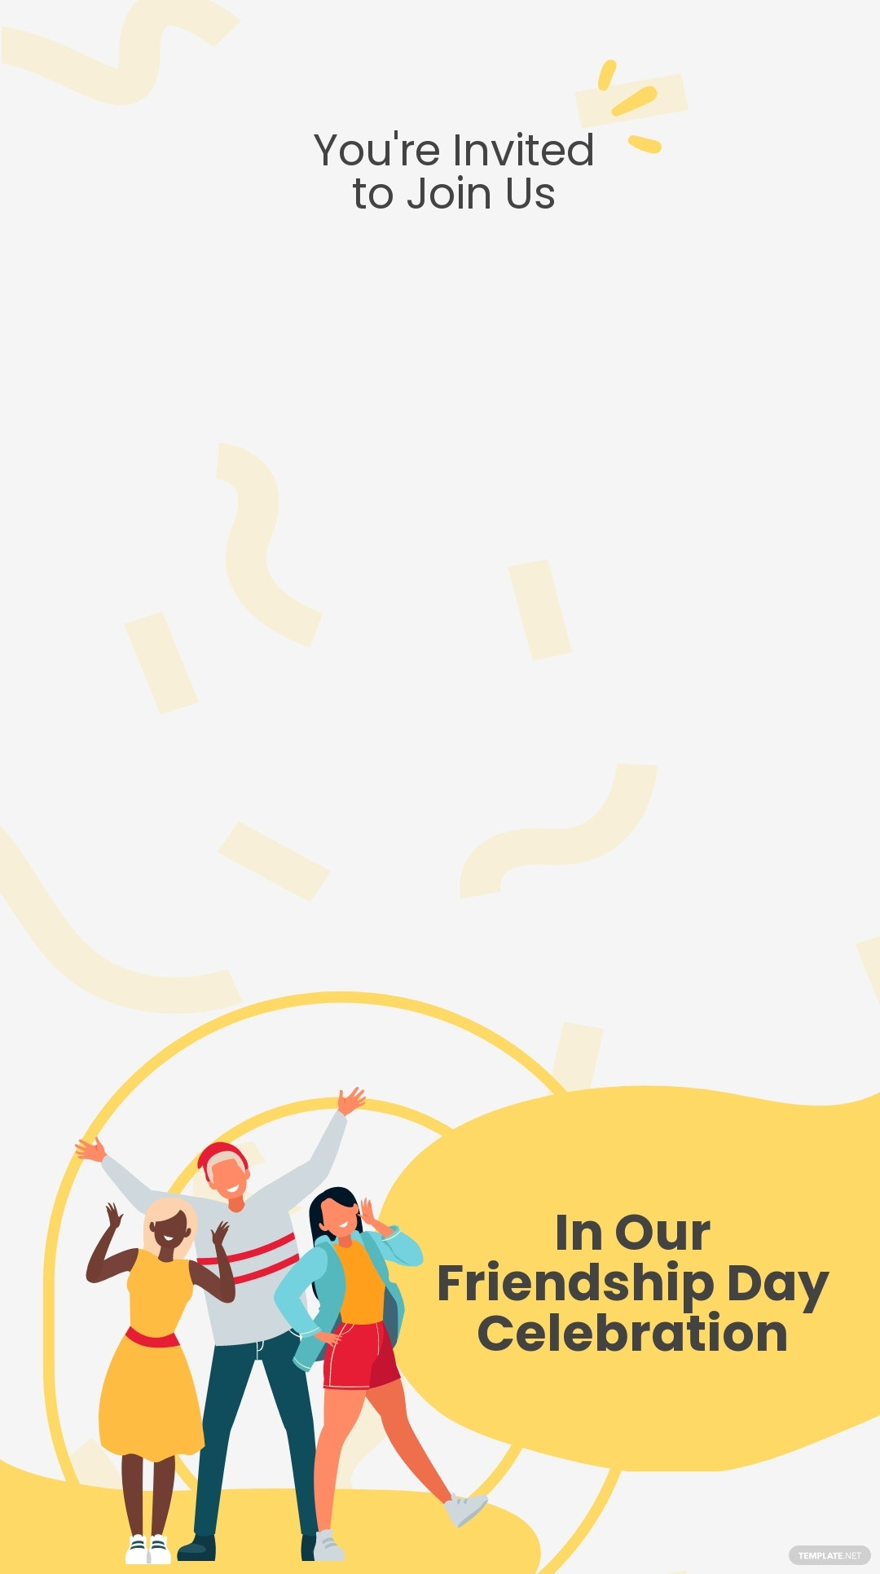 Friendship Day Celebration Snapchat Geofilter Template.jpe